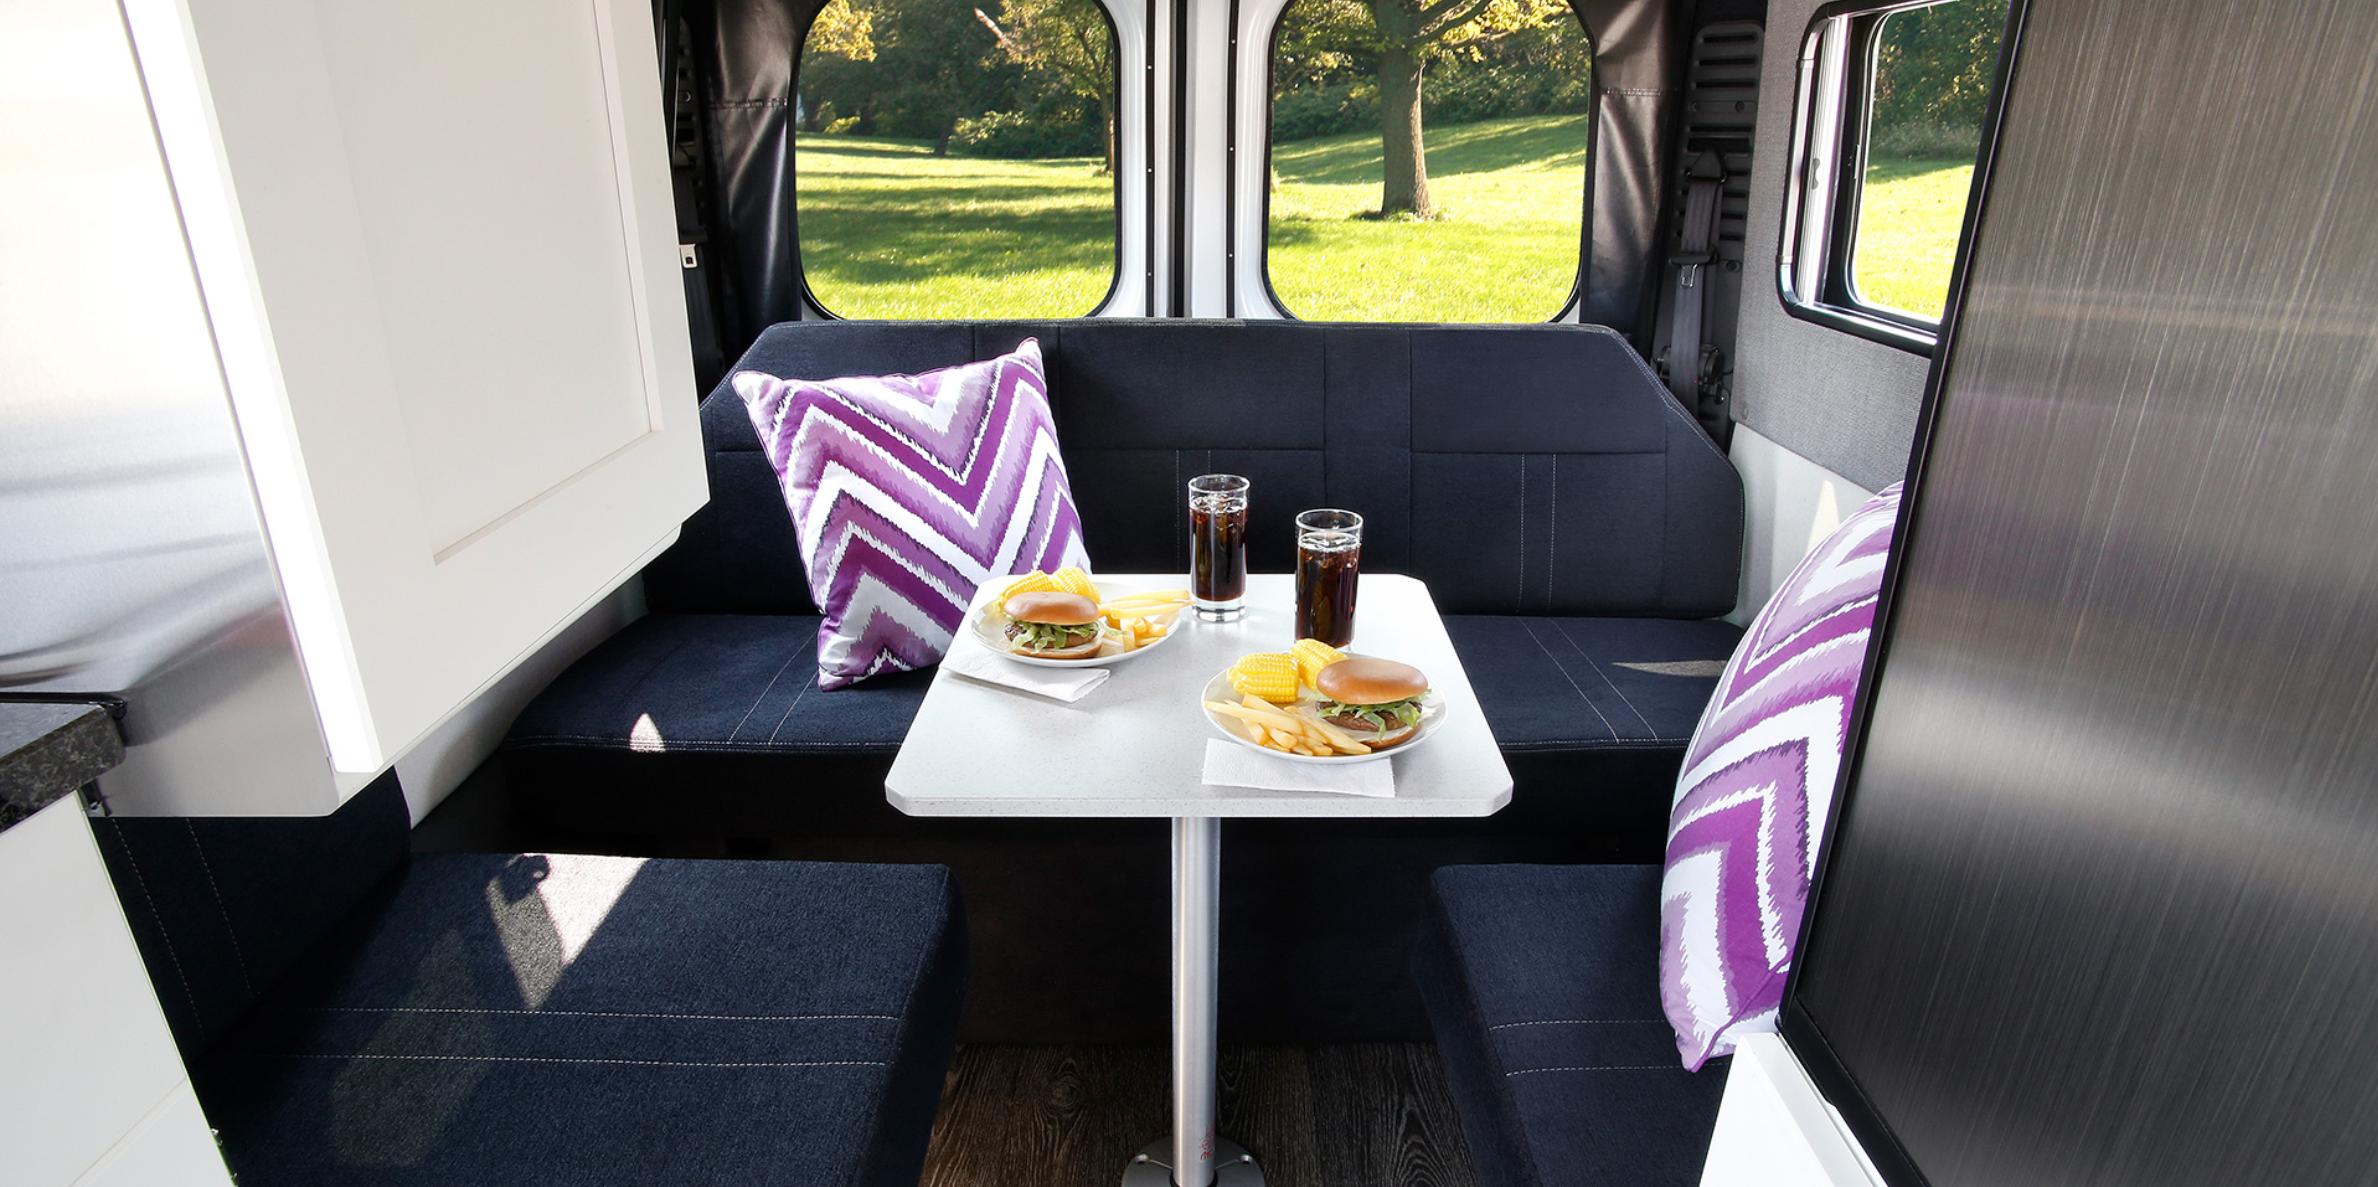 Rear dining area sits up to 5. Seats 3 while driving. (Source: Roadtrek). Roadtrek Zion SRT 2019